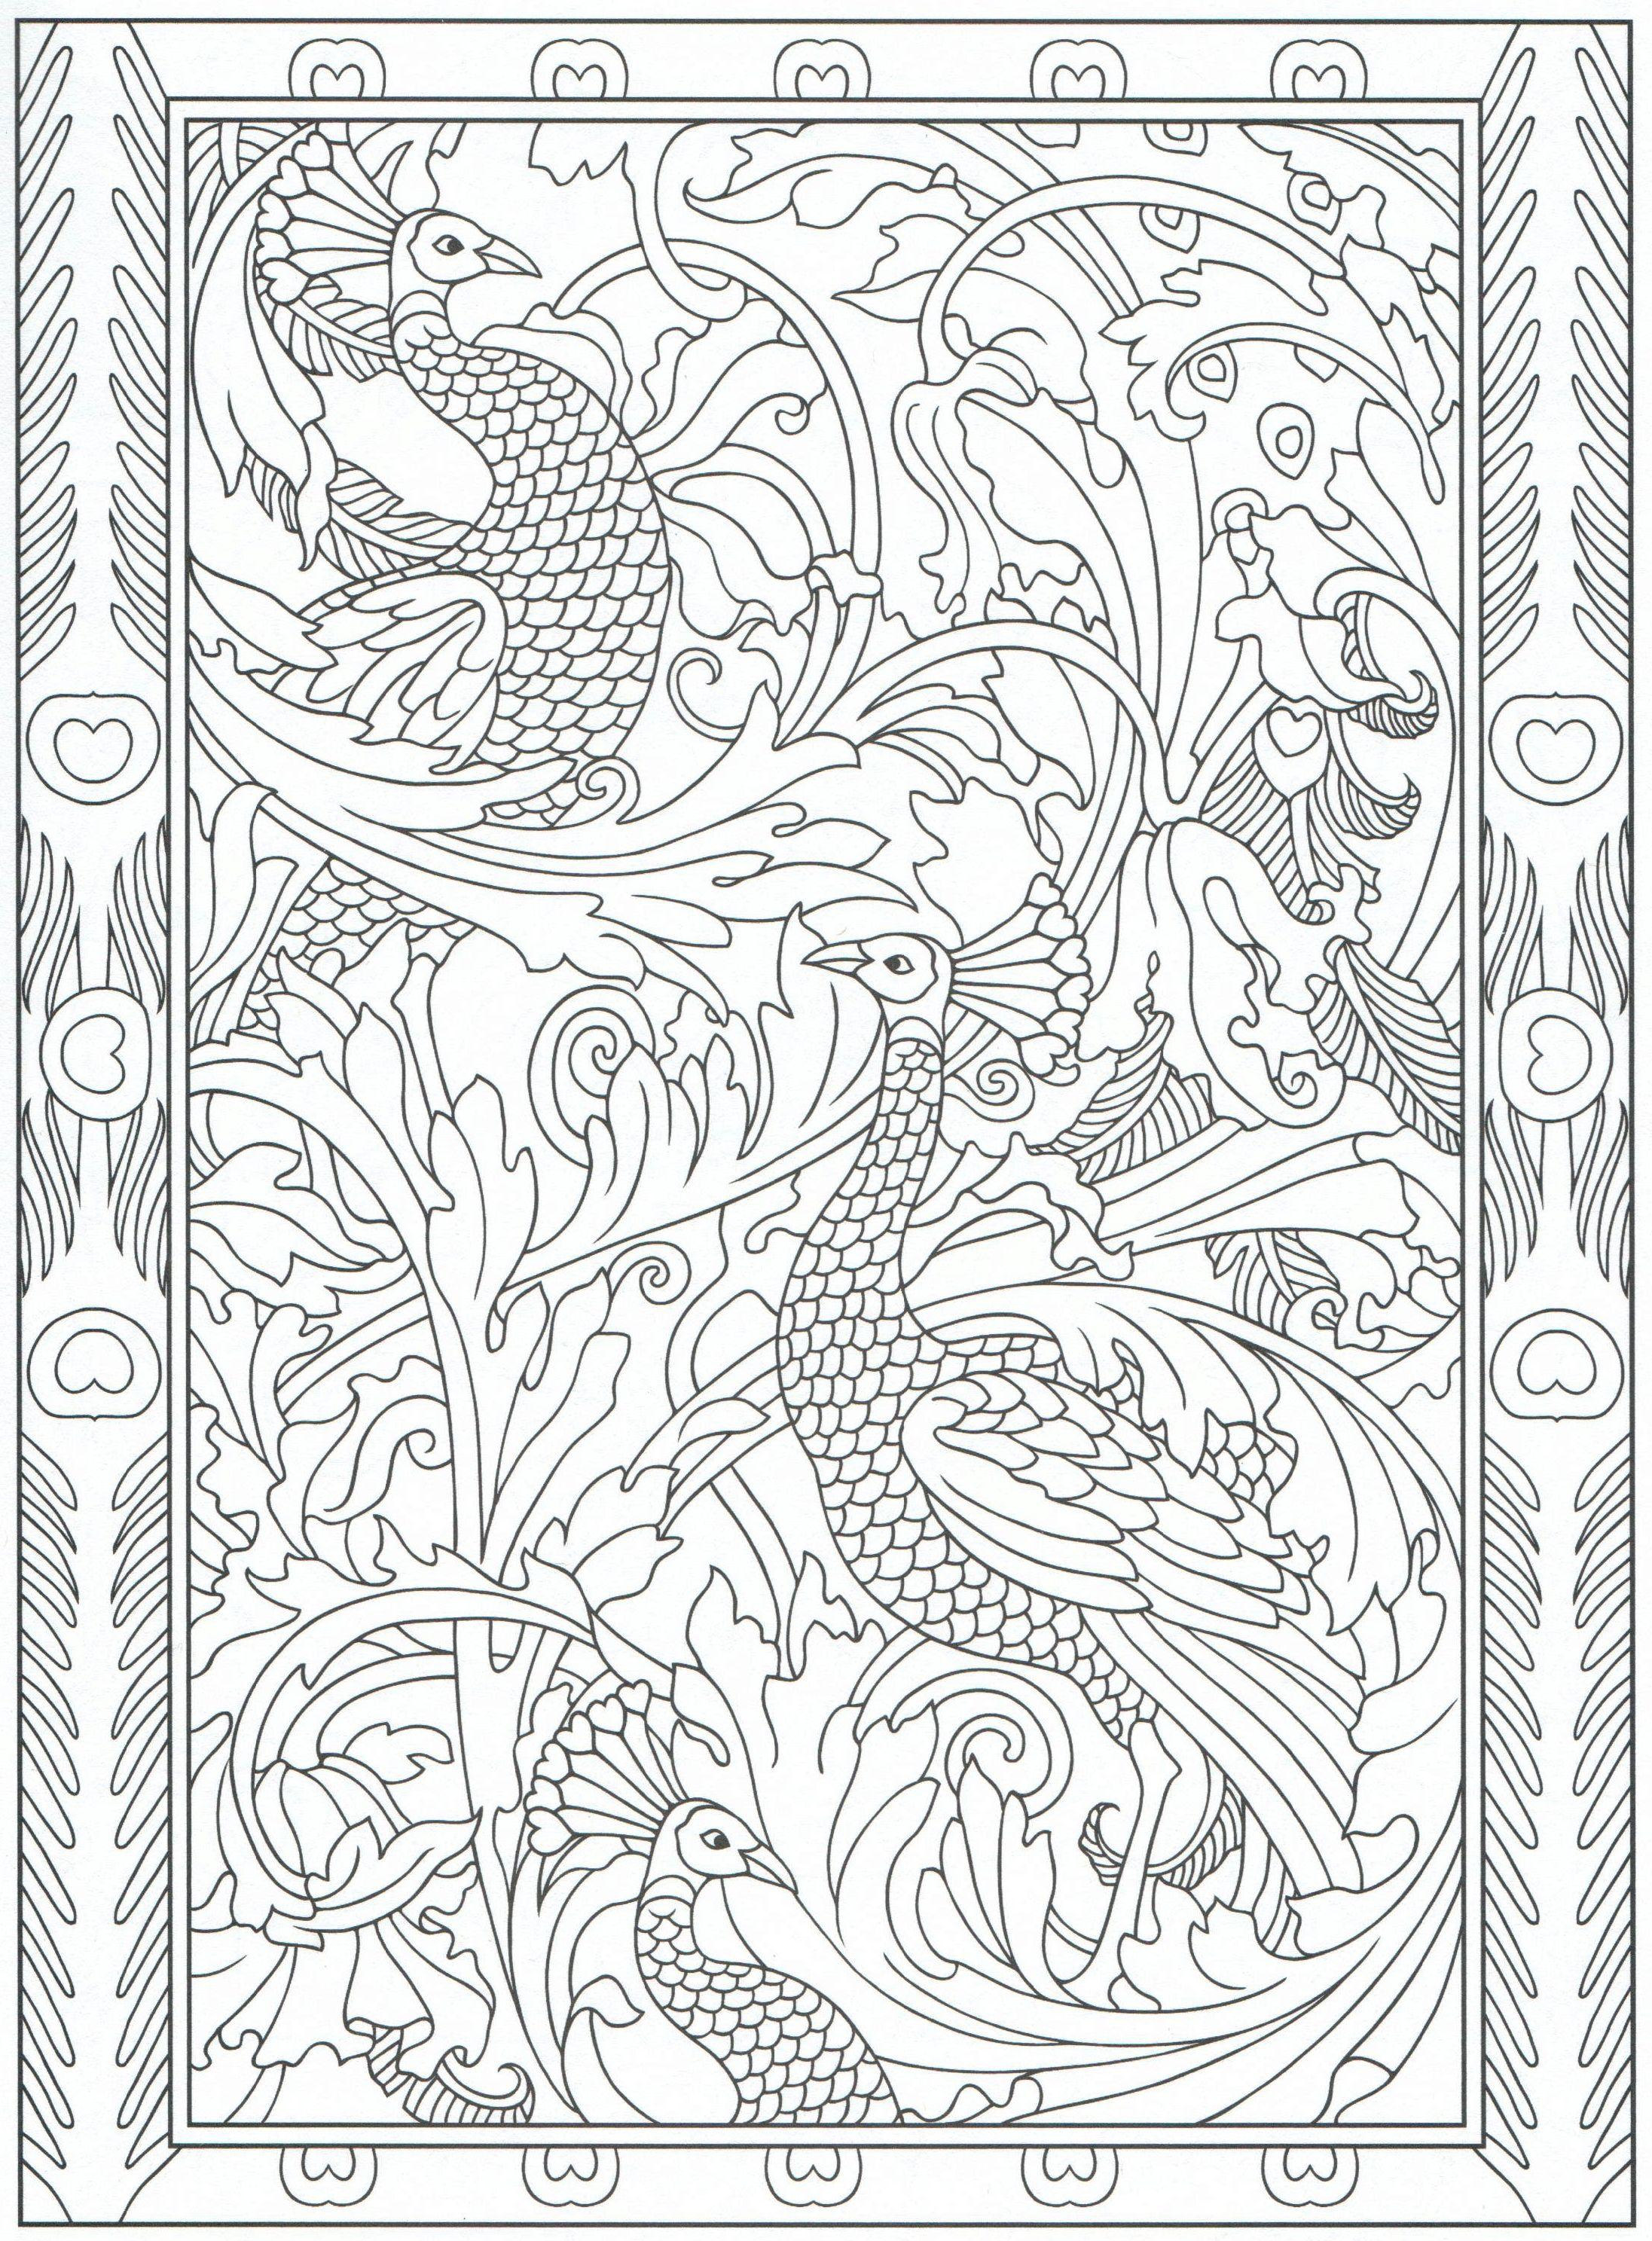 Peacock coloring page, for adults 5/31 | KOLOROWANKI | Pinterest ...